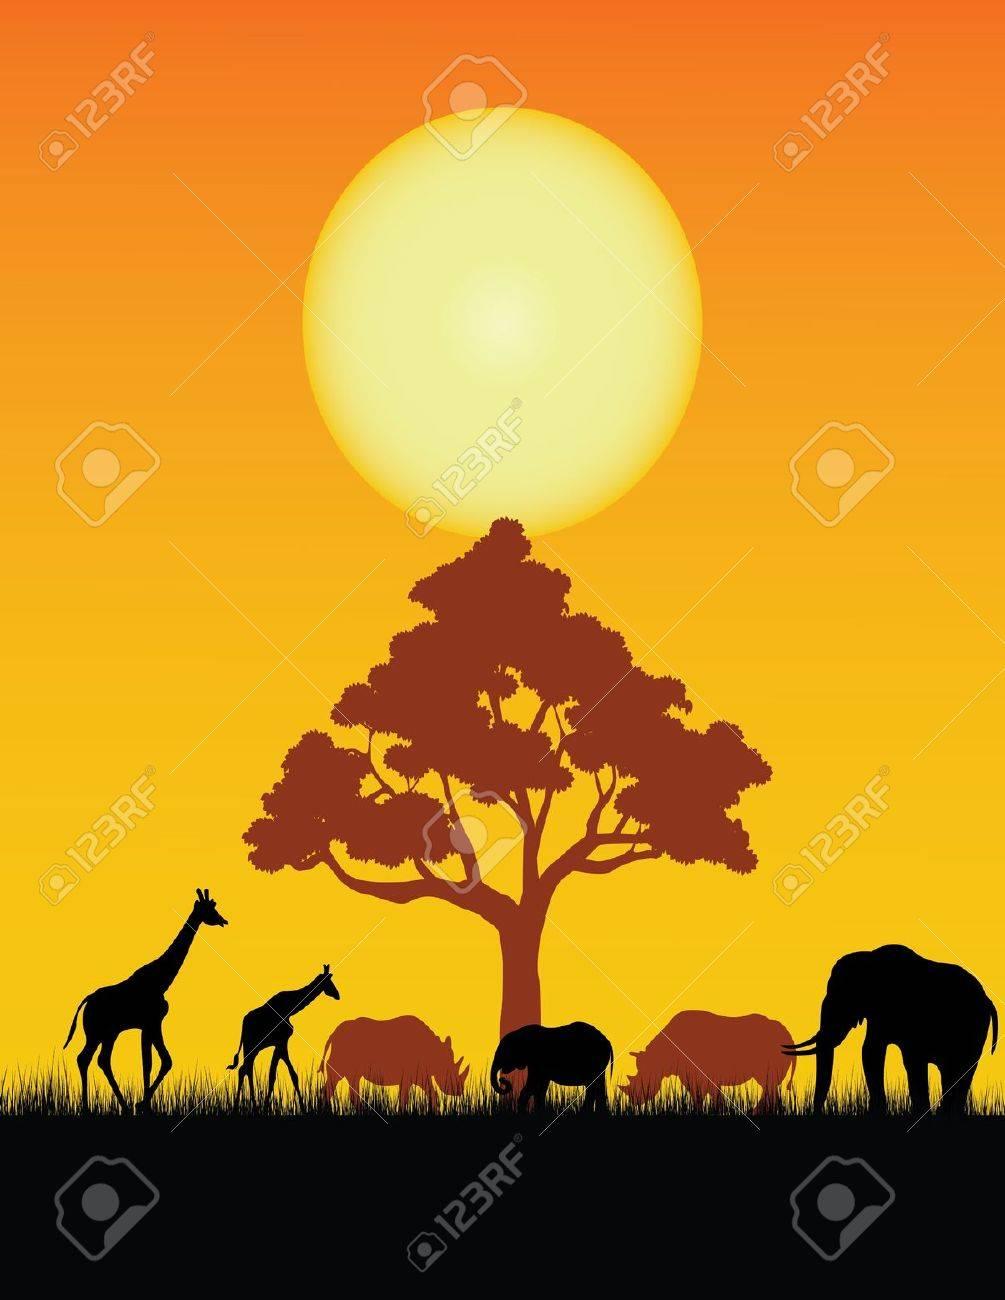 wild animal silhouette Stock Vector - 12544979